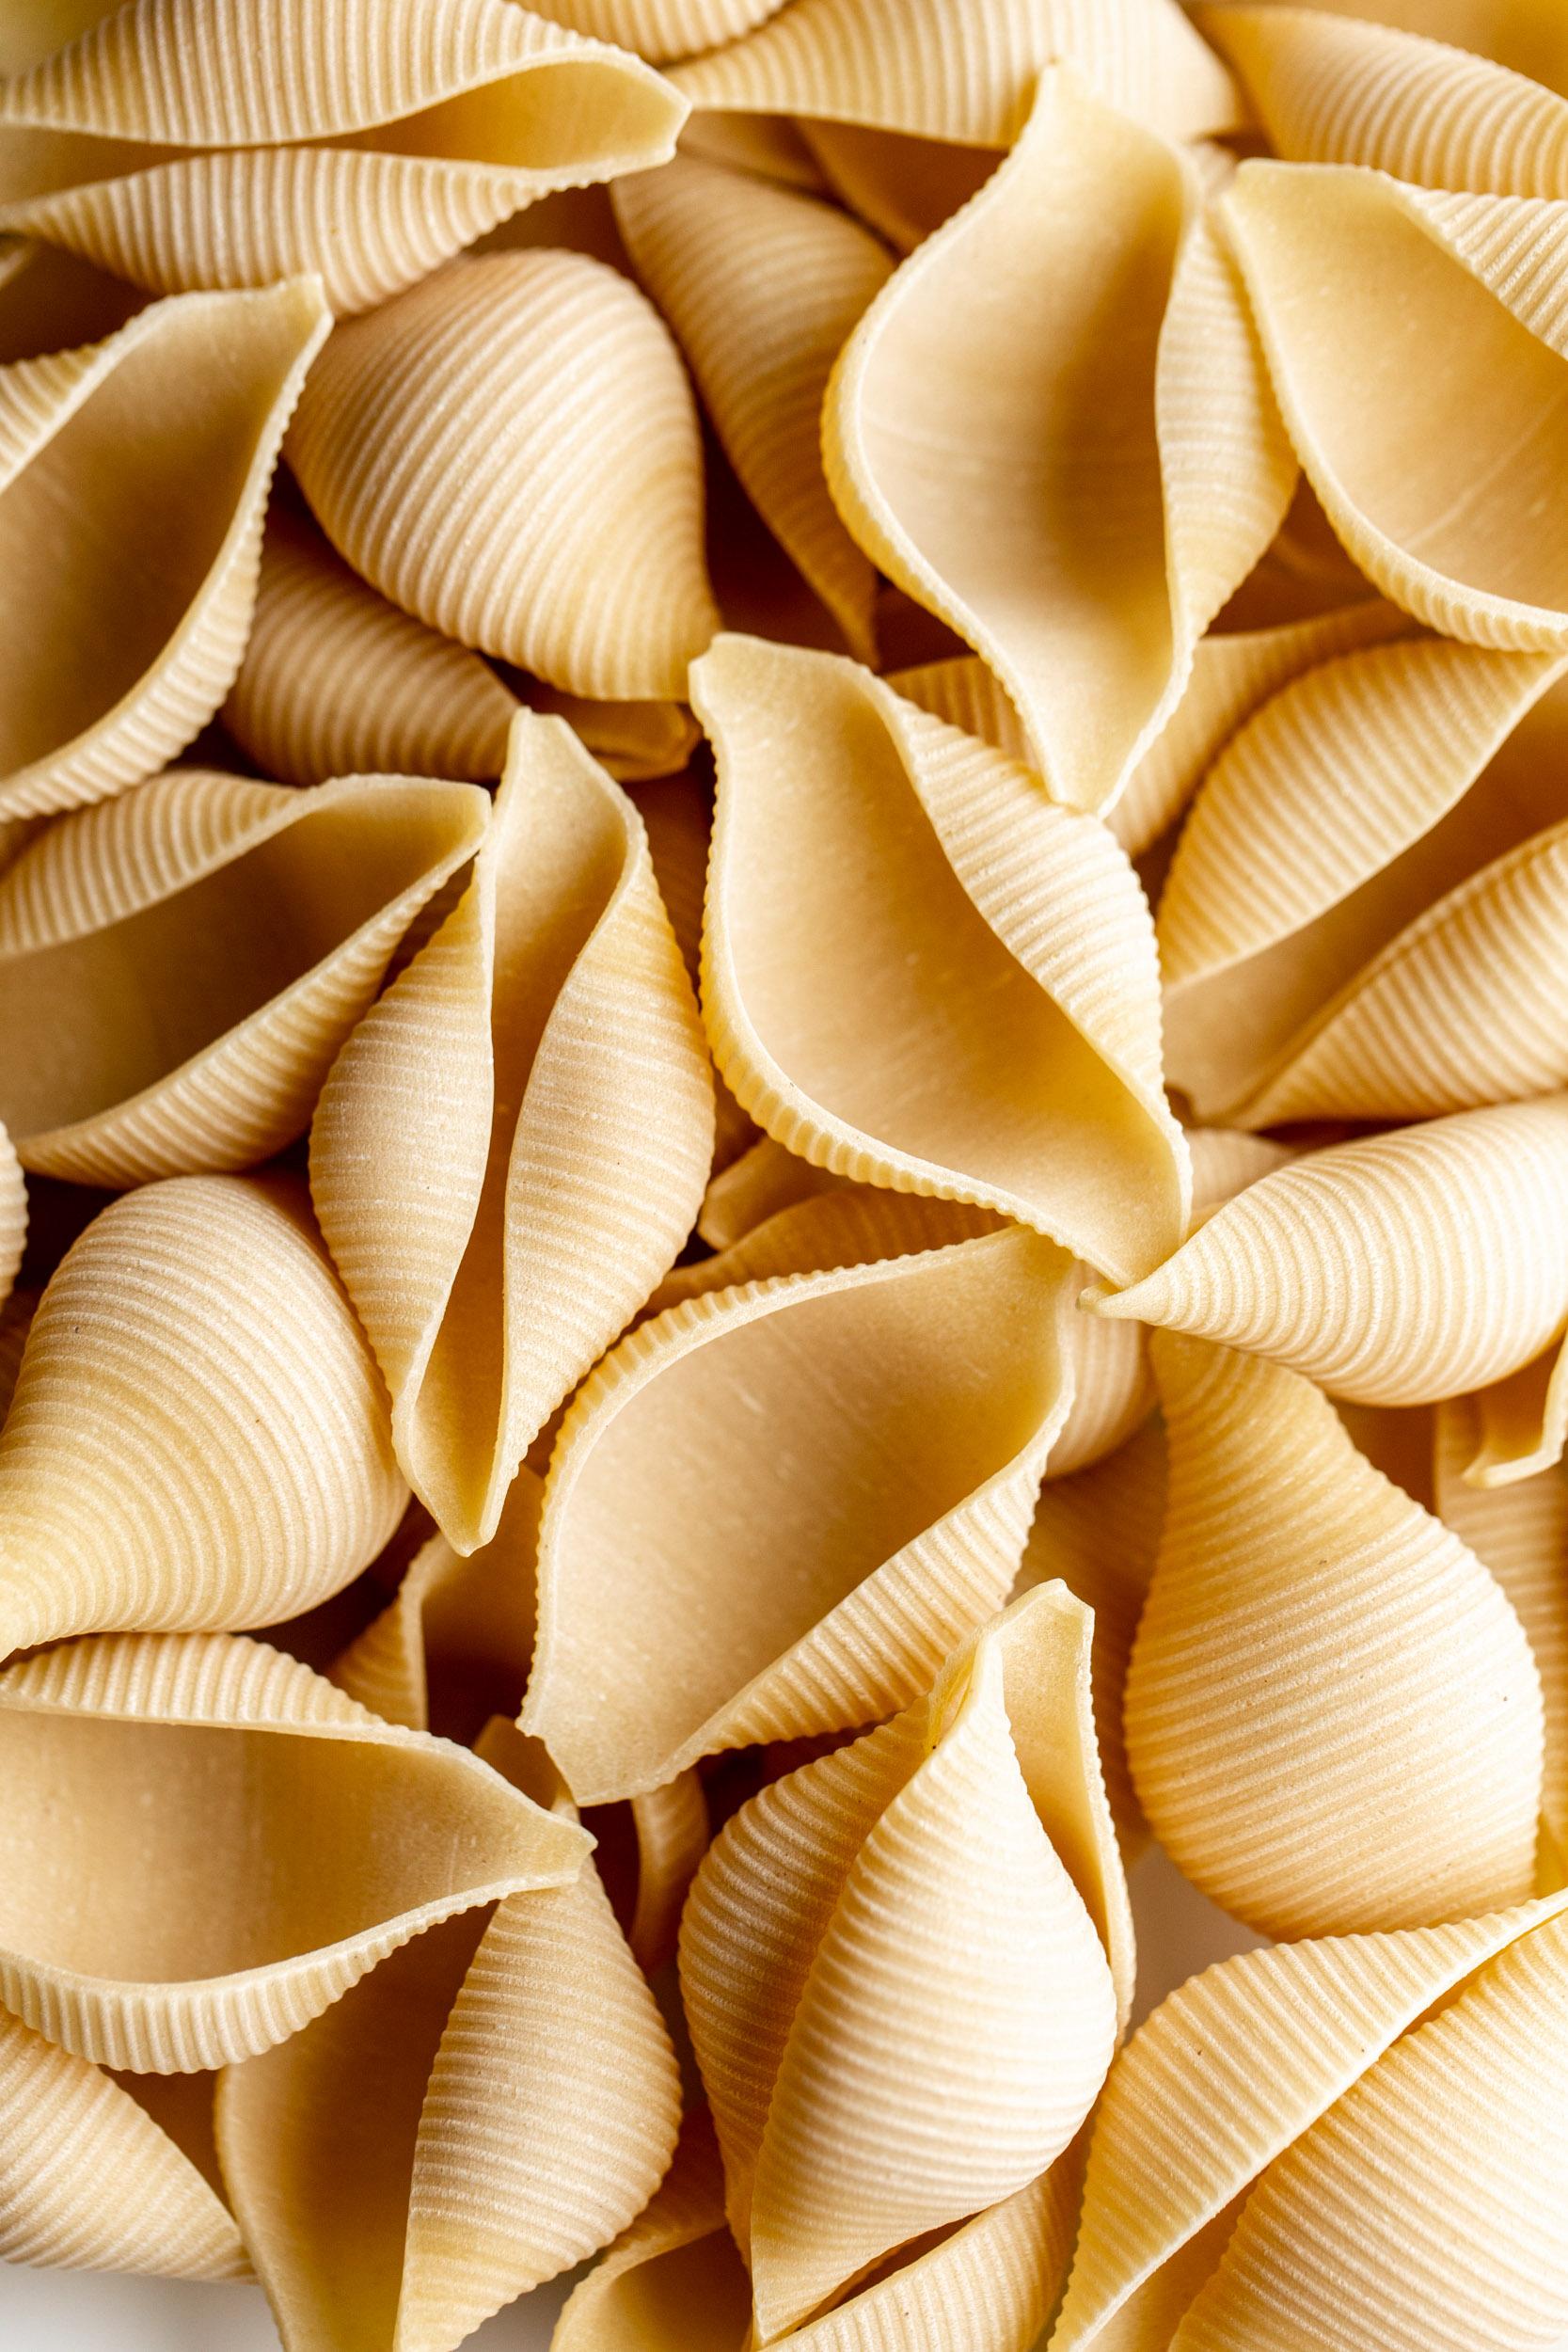 Baked Stuffed Shells recipe